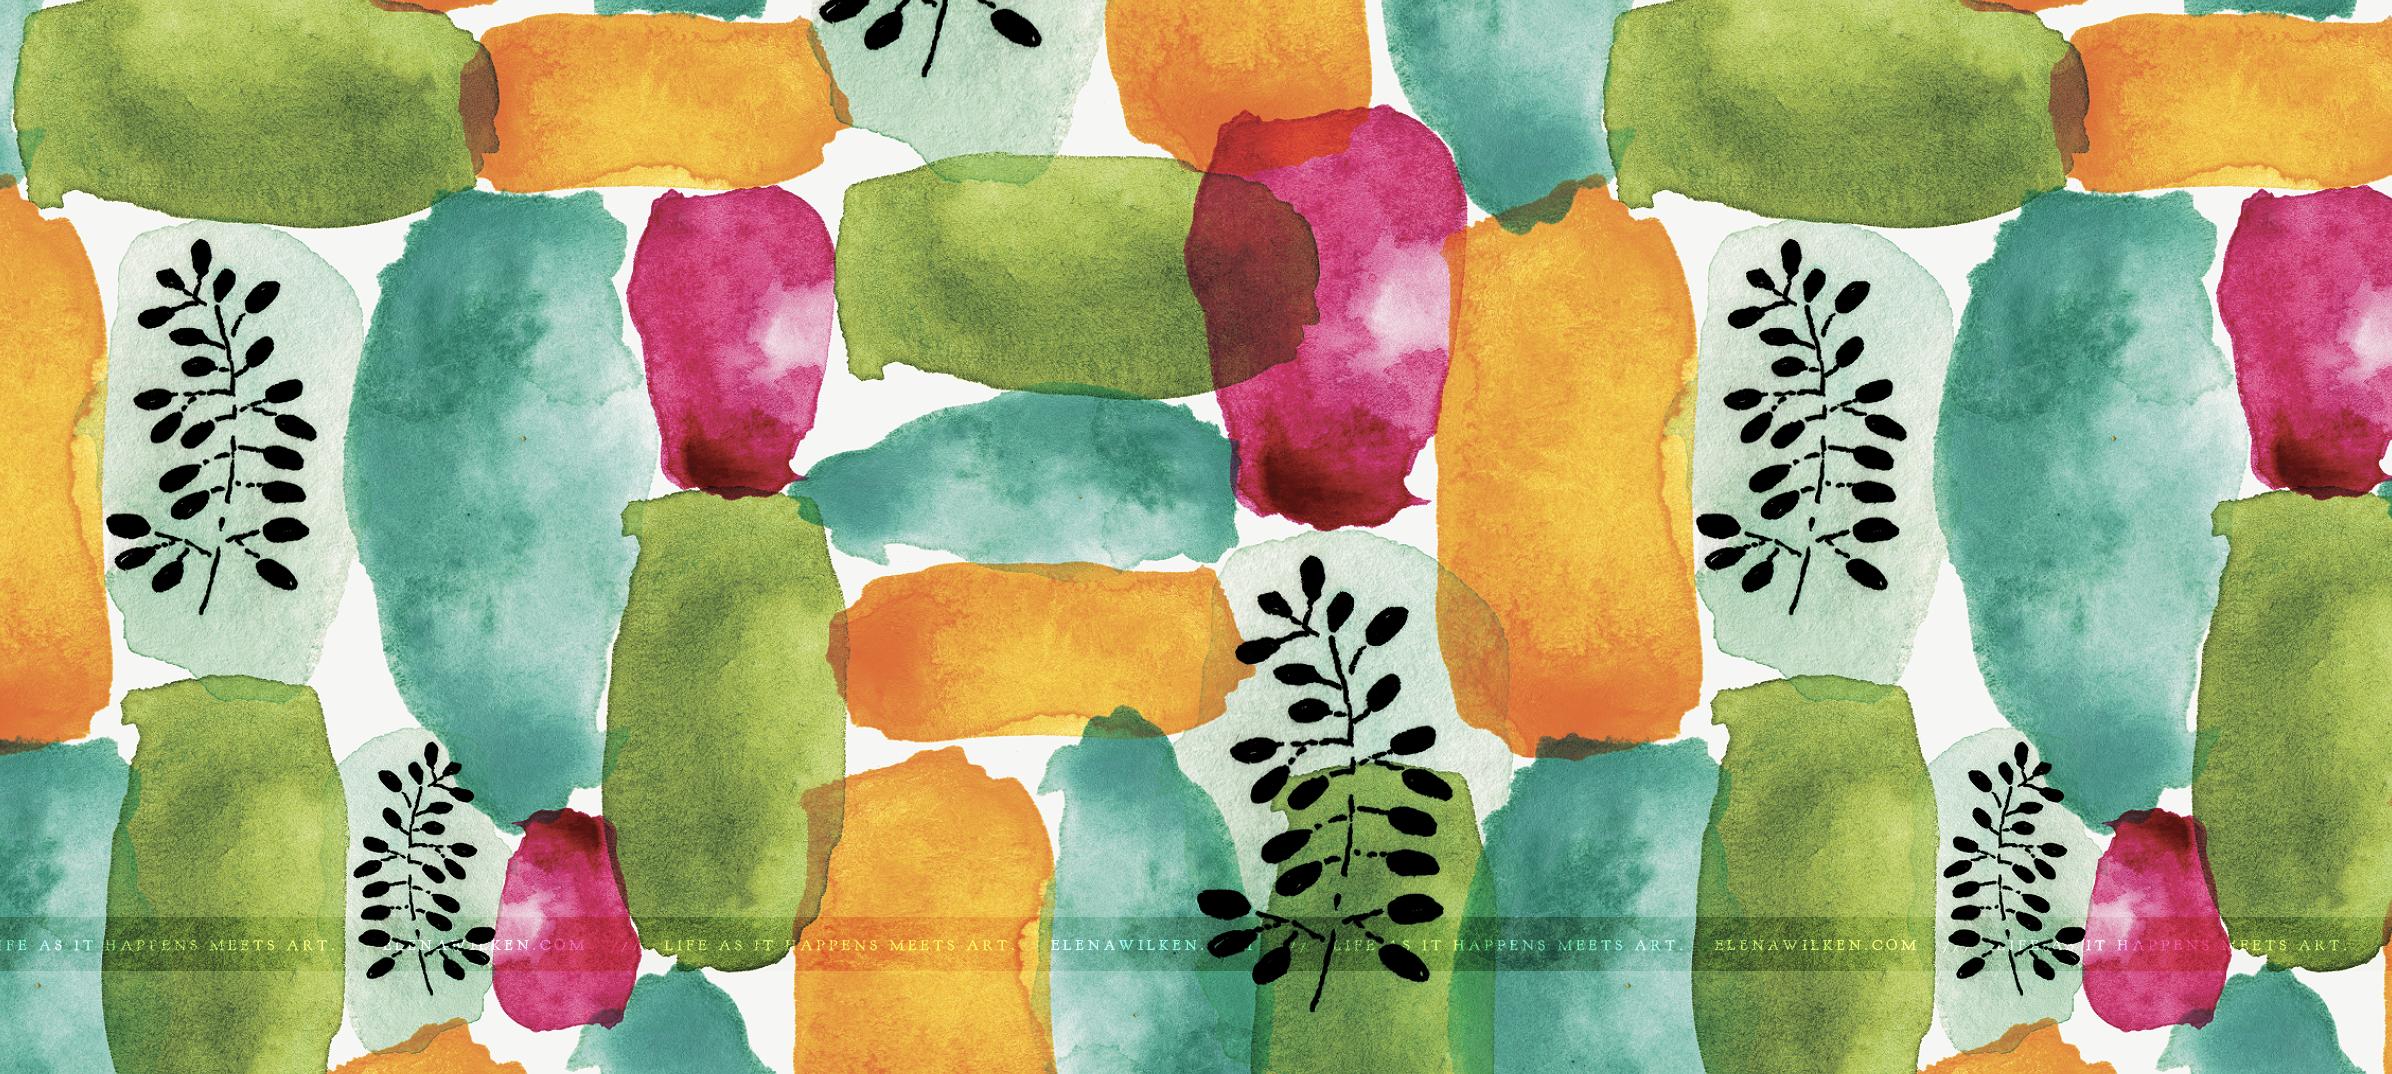 elena-wilken-whimsical-watercolor-fields-surface-pattern-design5.png